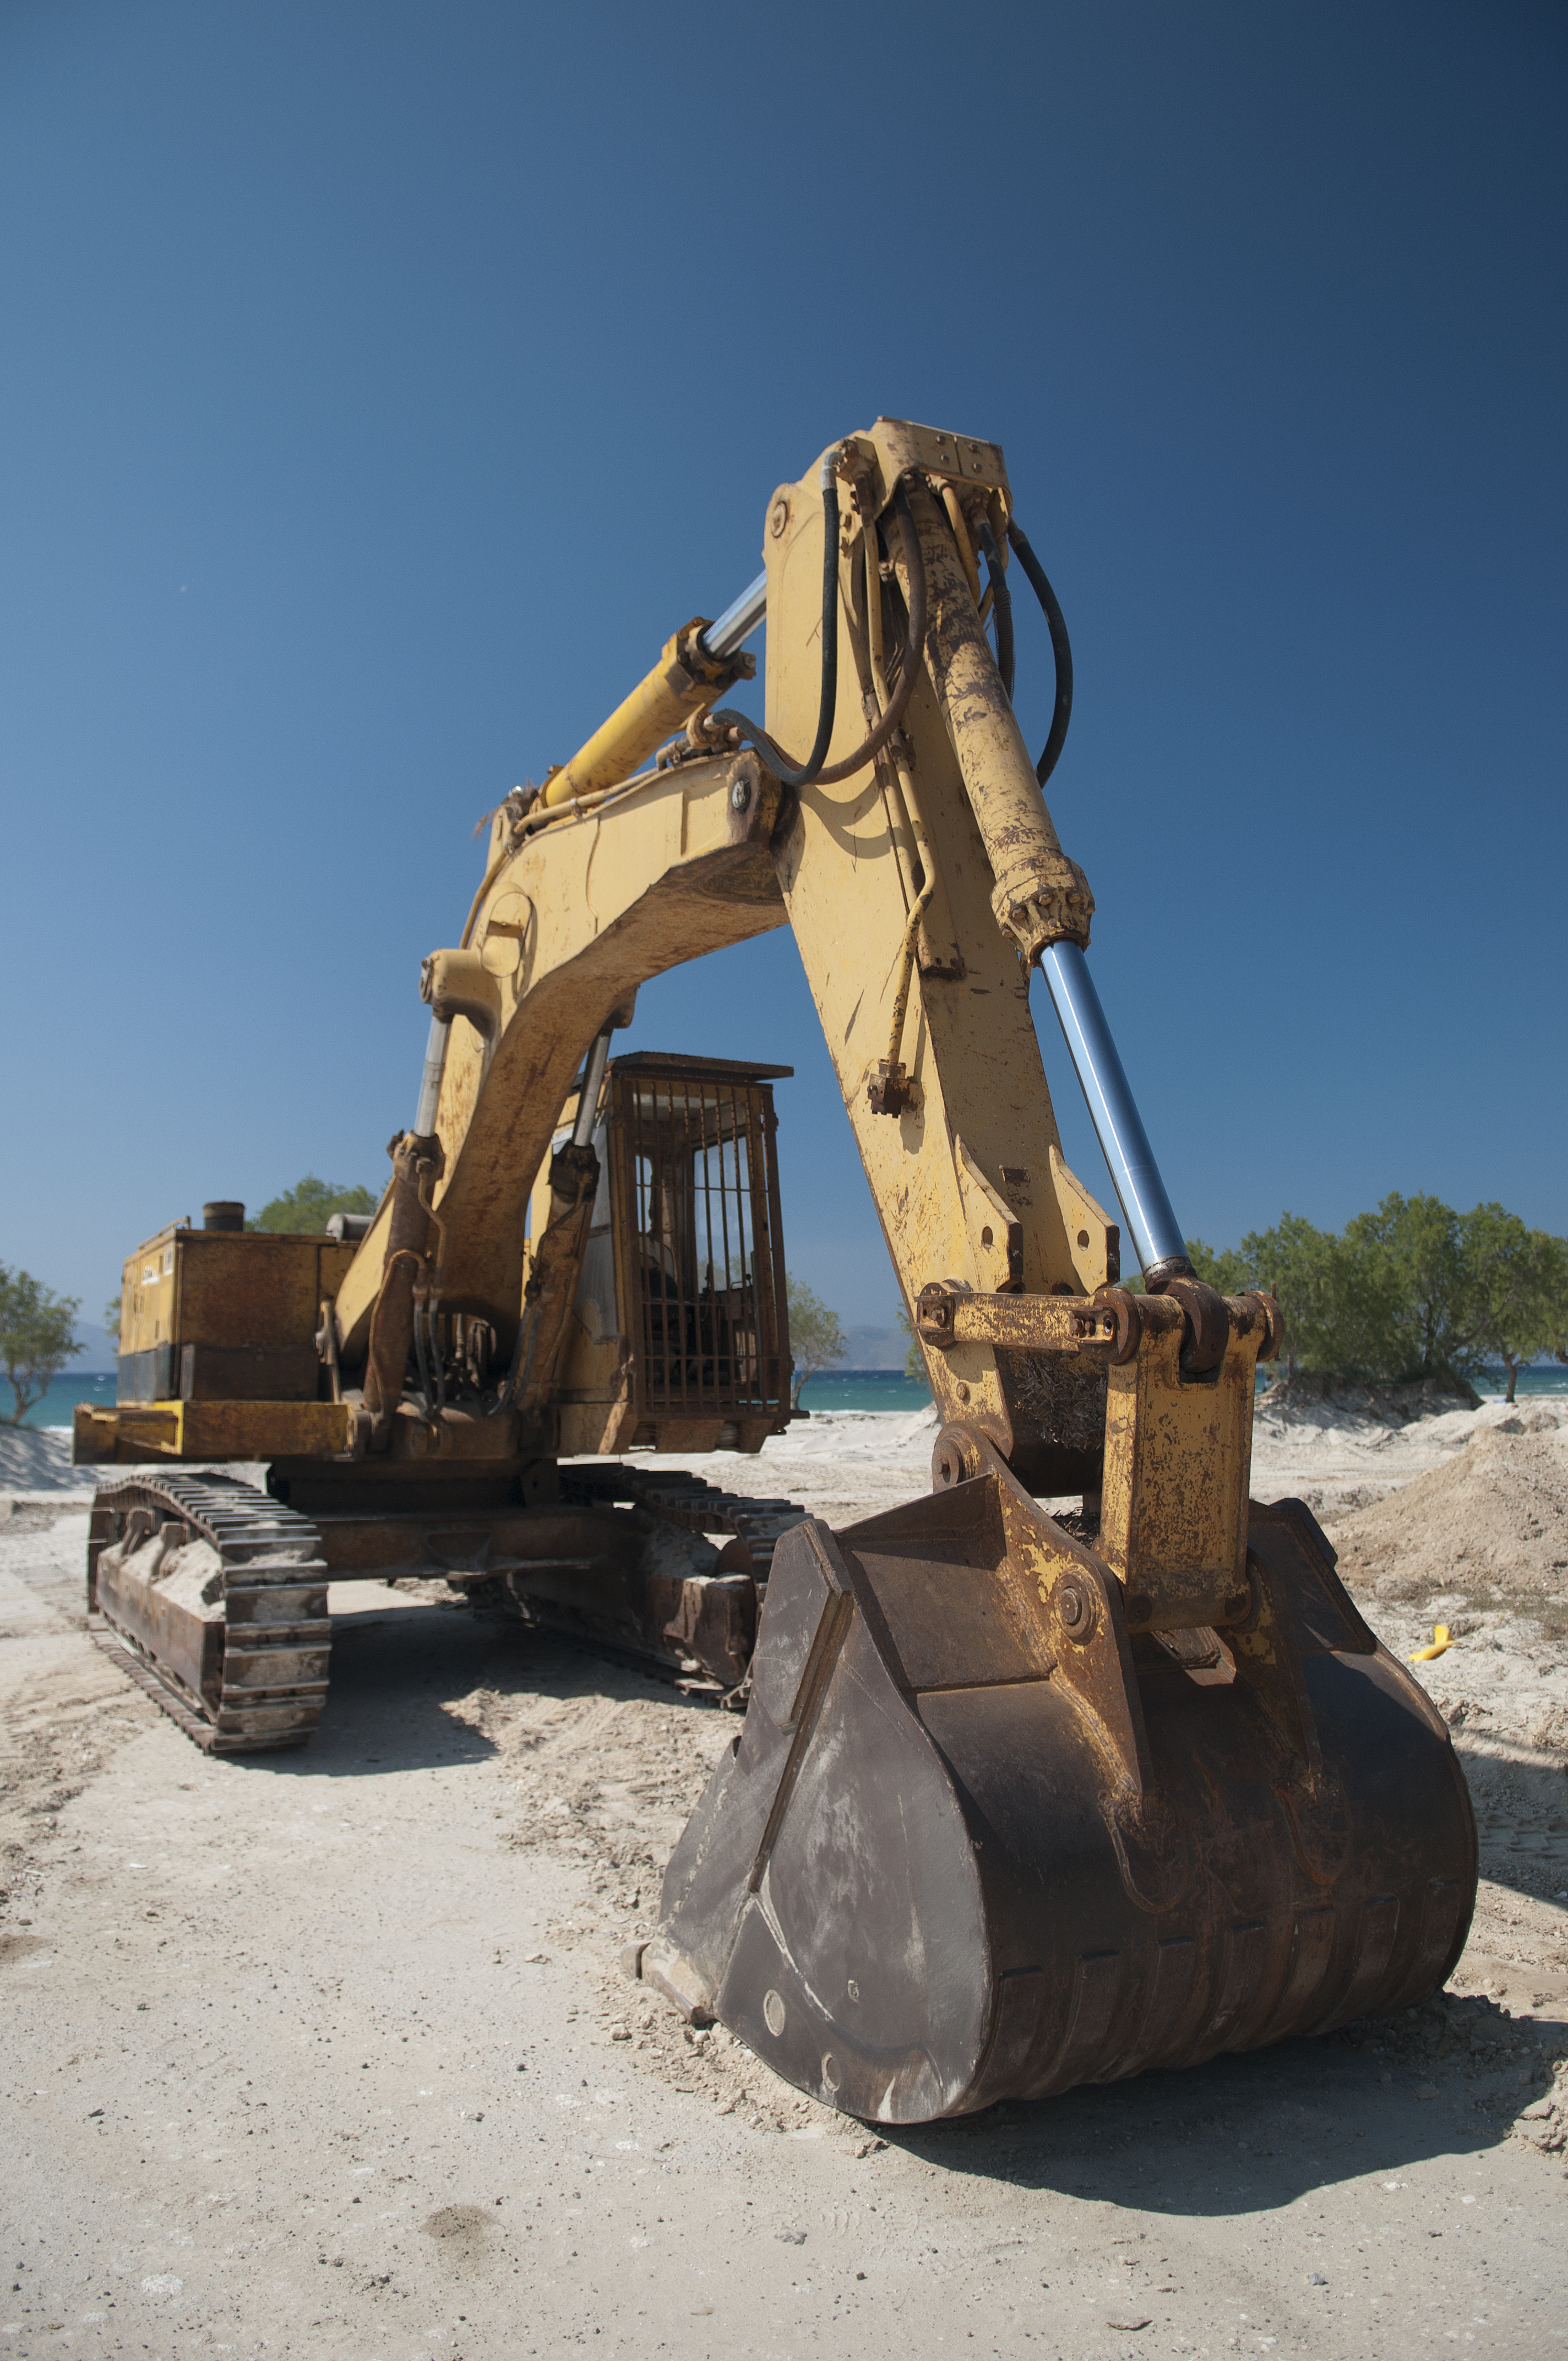 view of heavy equipment - photo #20